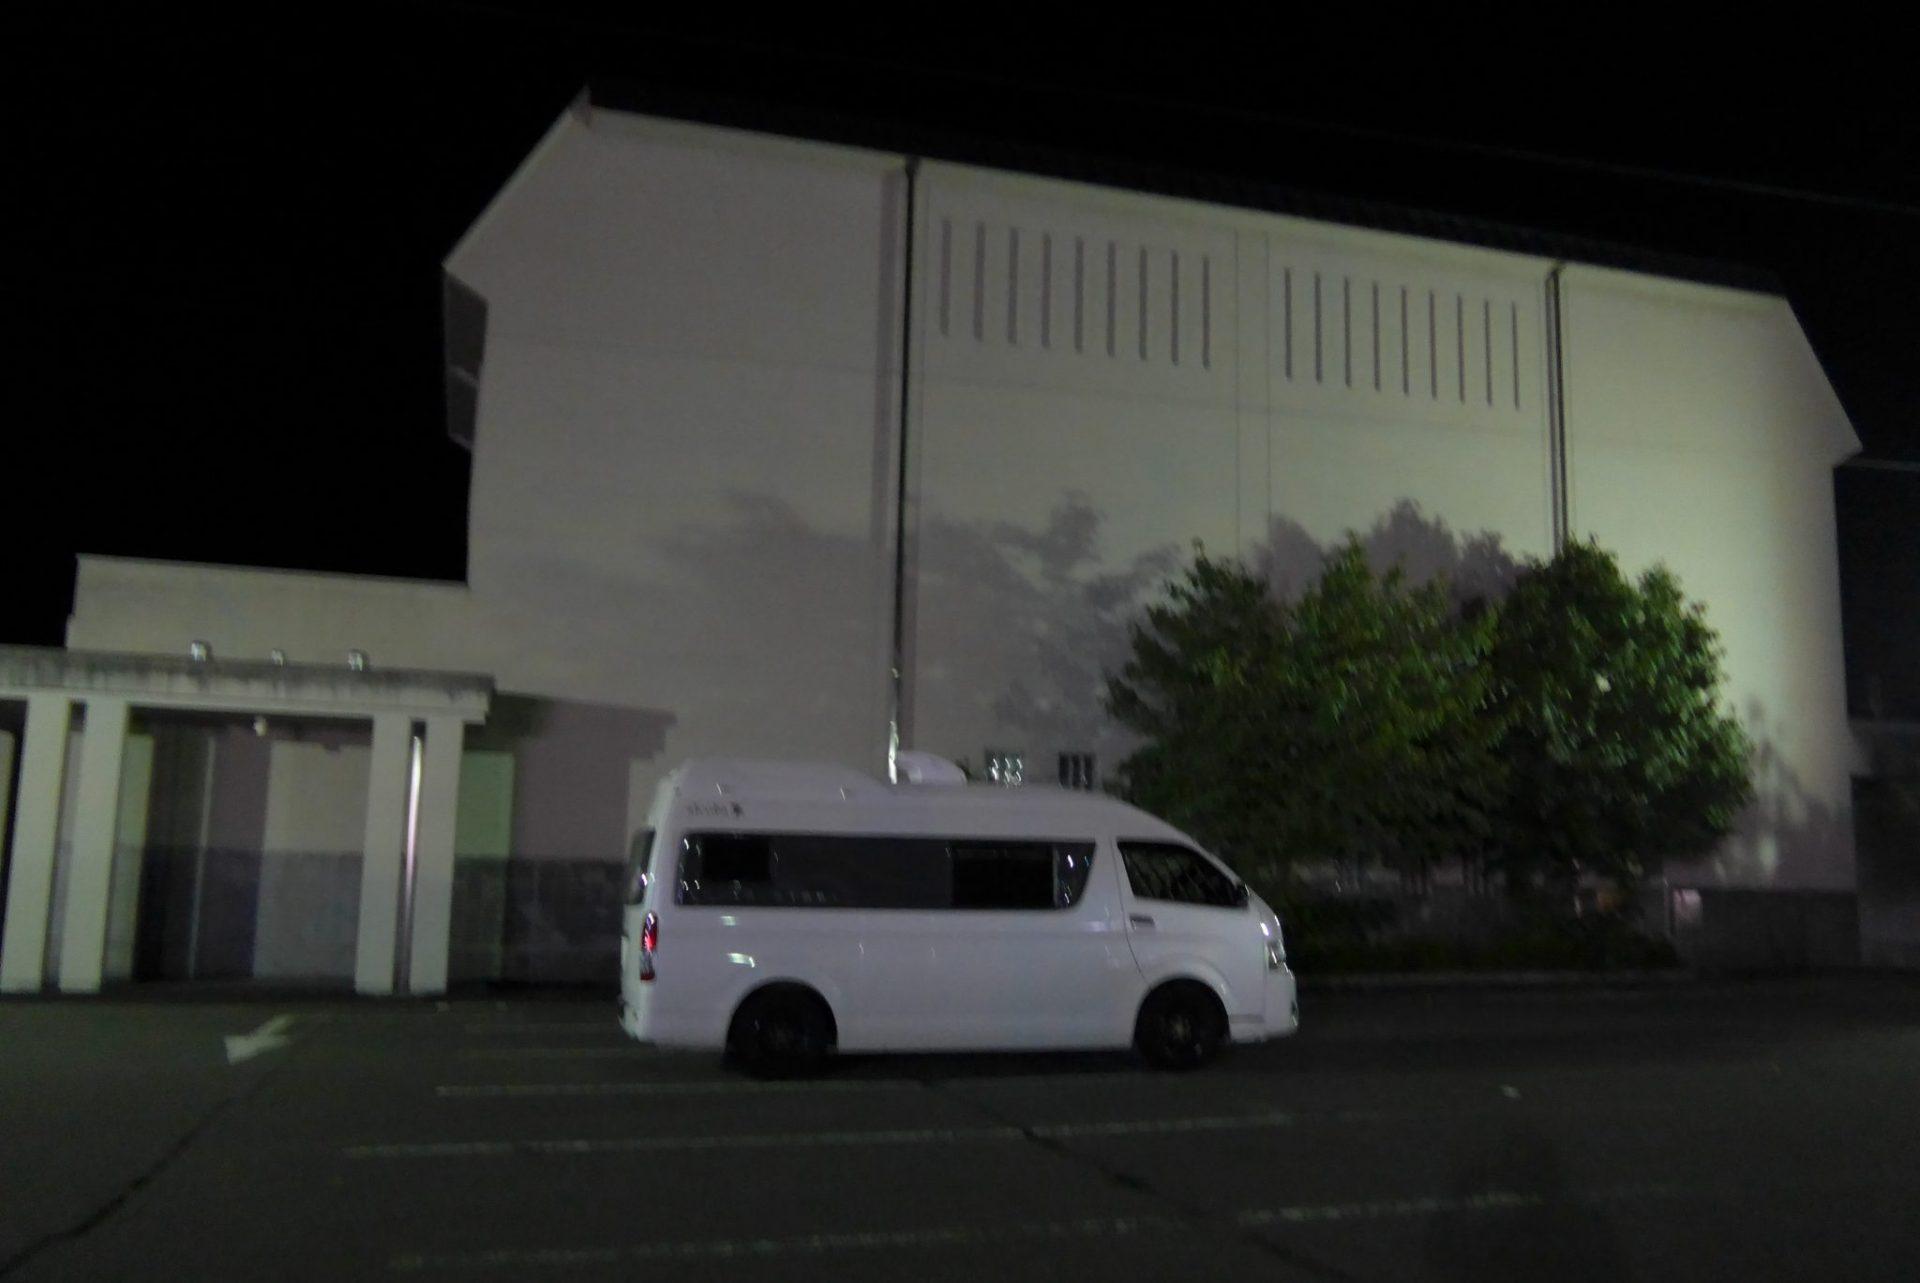 (K)道の駅くつき新本陣の車中泊〜平坦駐車場とコンビニが魅力〜